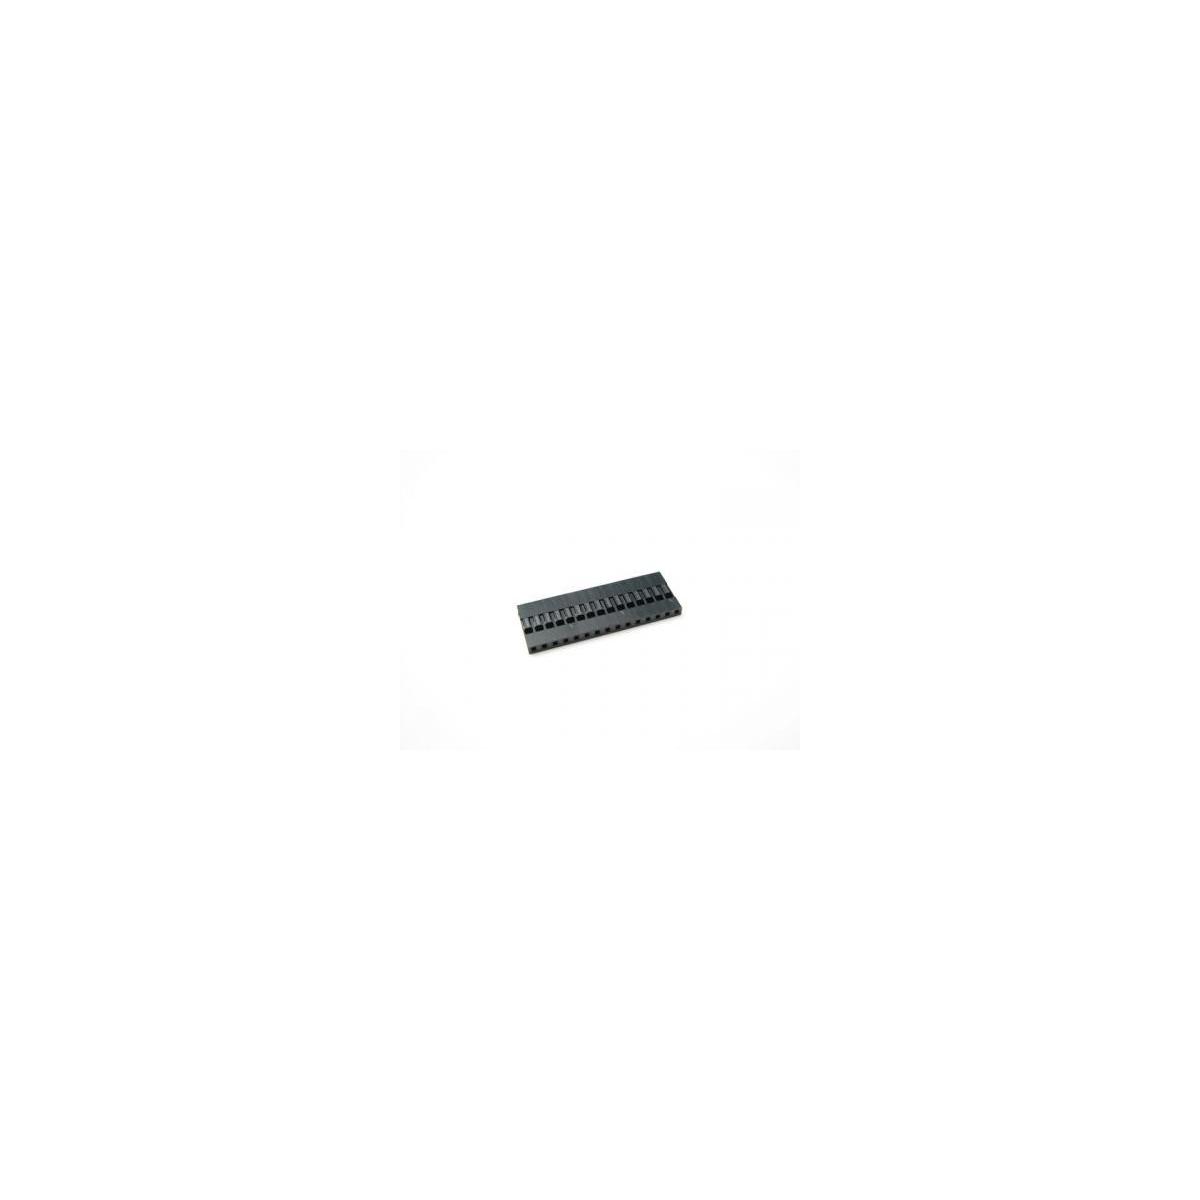 MODU MLS-15 1X15 VIAS - 2,54MM/180º - METALTEX-